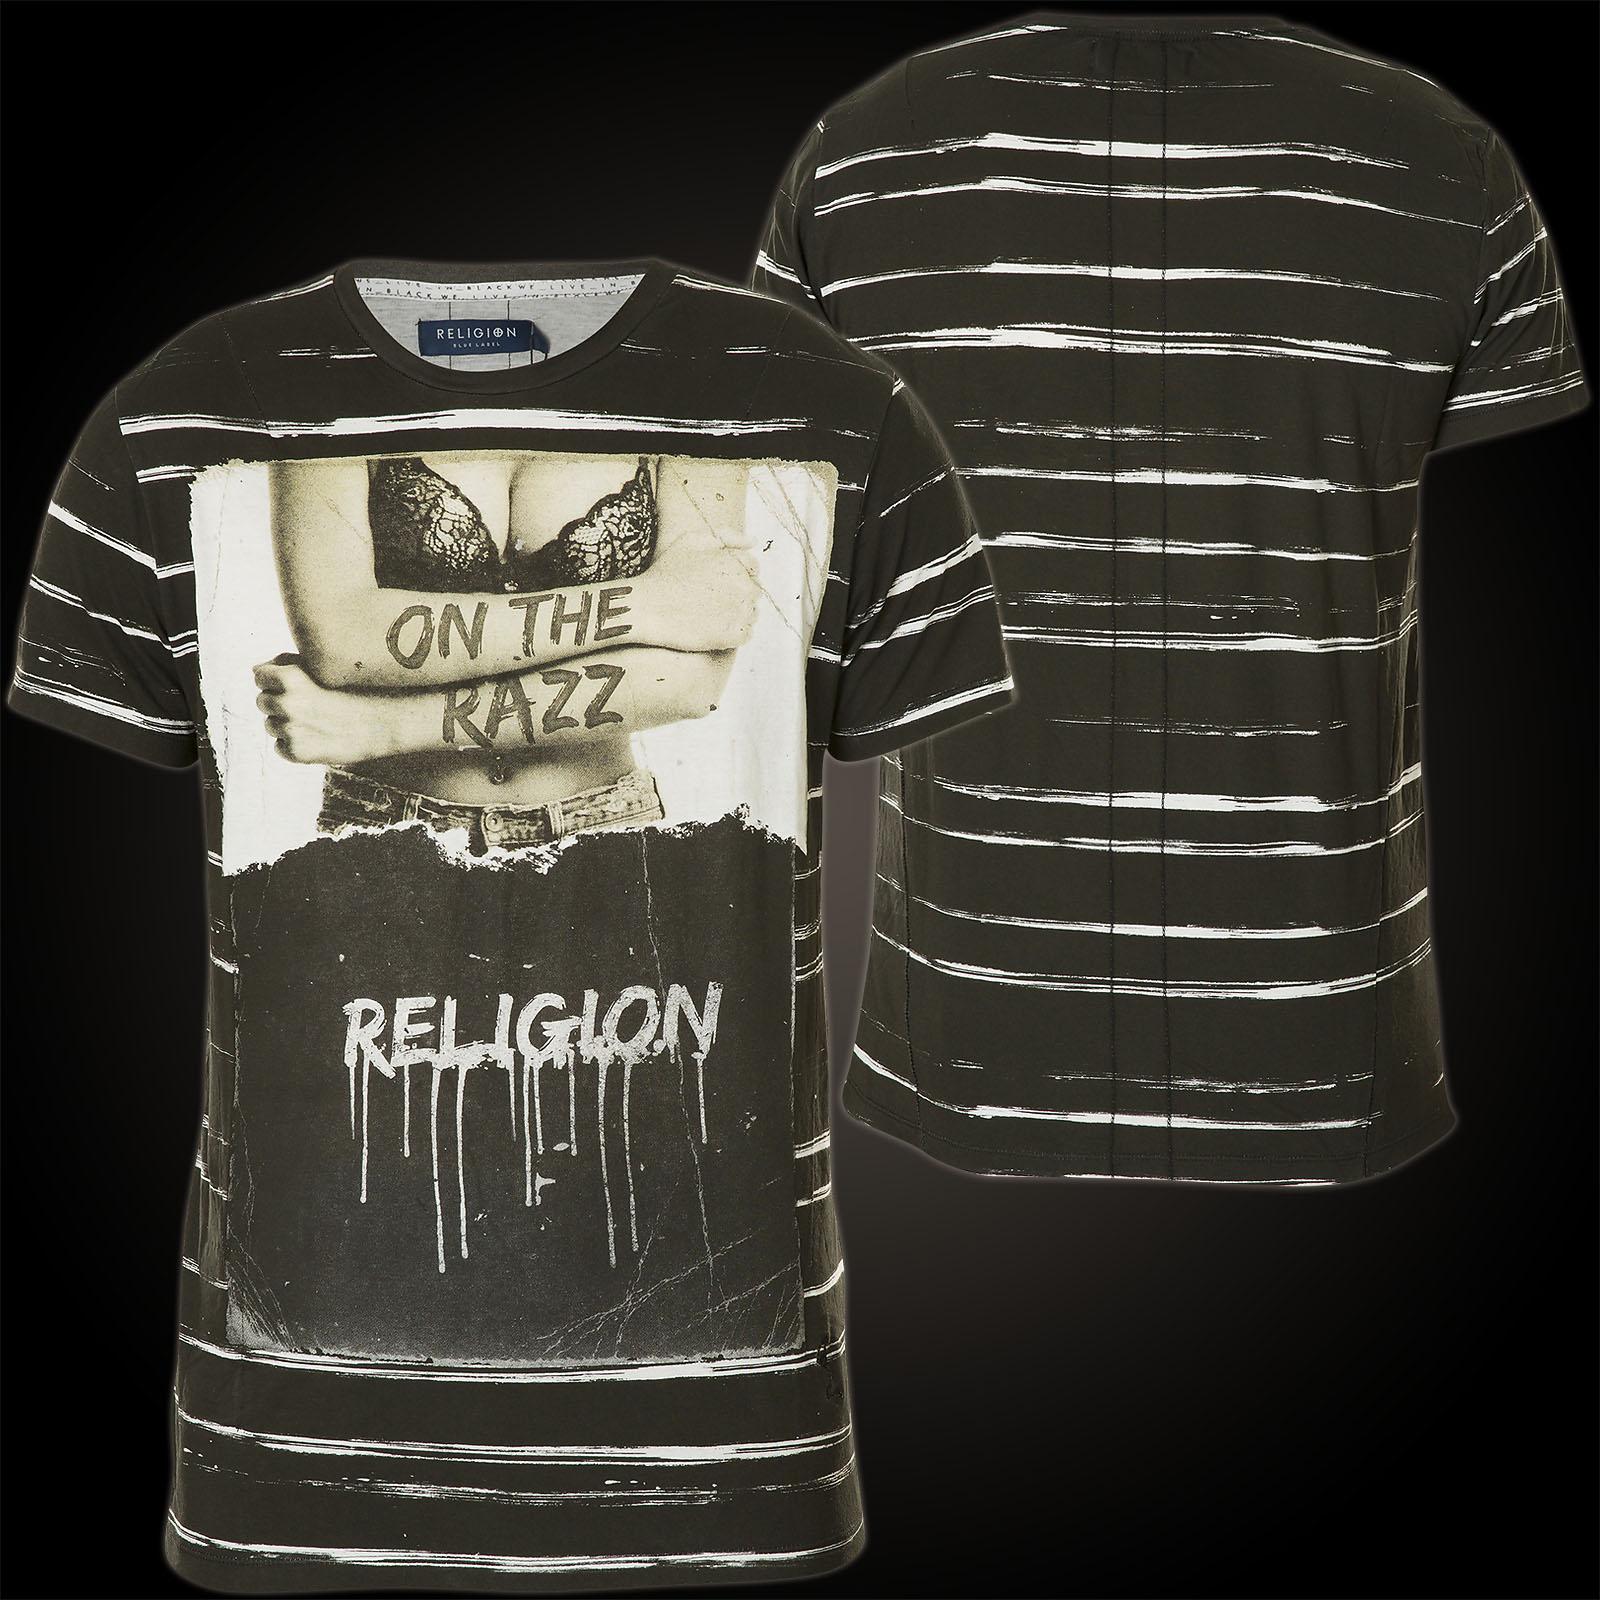 Religion T-Shirt On The Razz MBOZG05 White/Stripe Black Schwarz ...